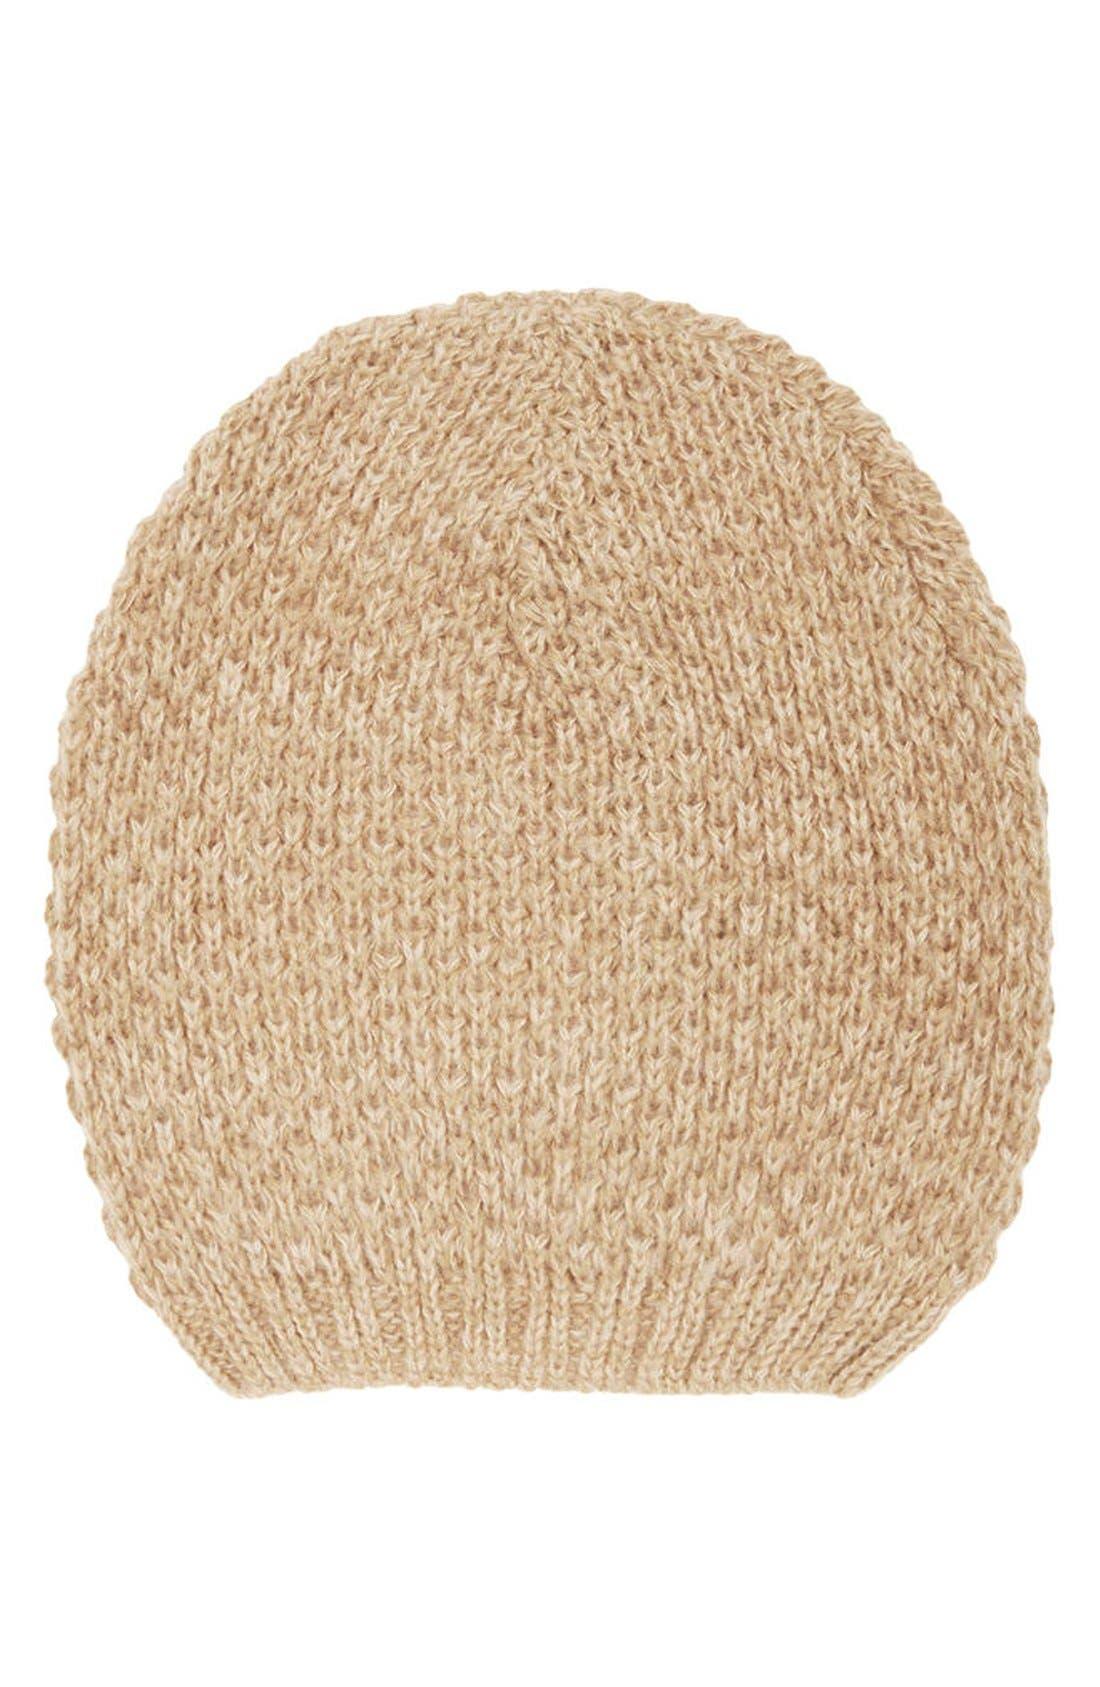 Basket Stitch Beanie,                             Main thumbnail 1, color,                             252